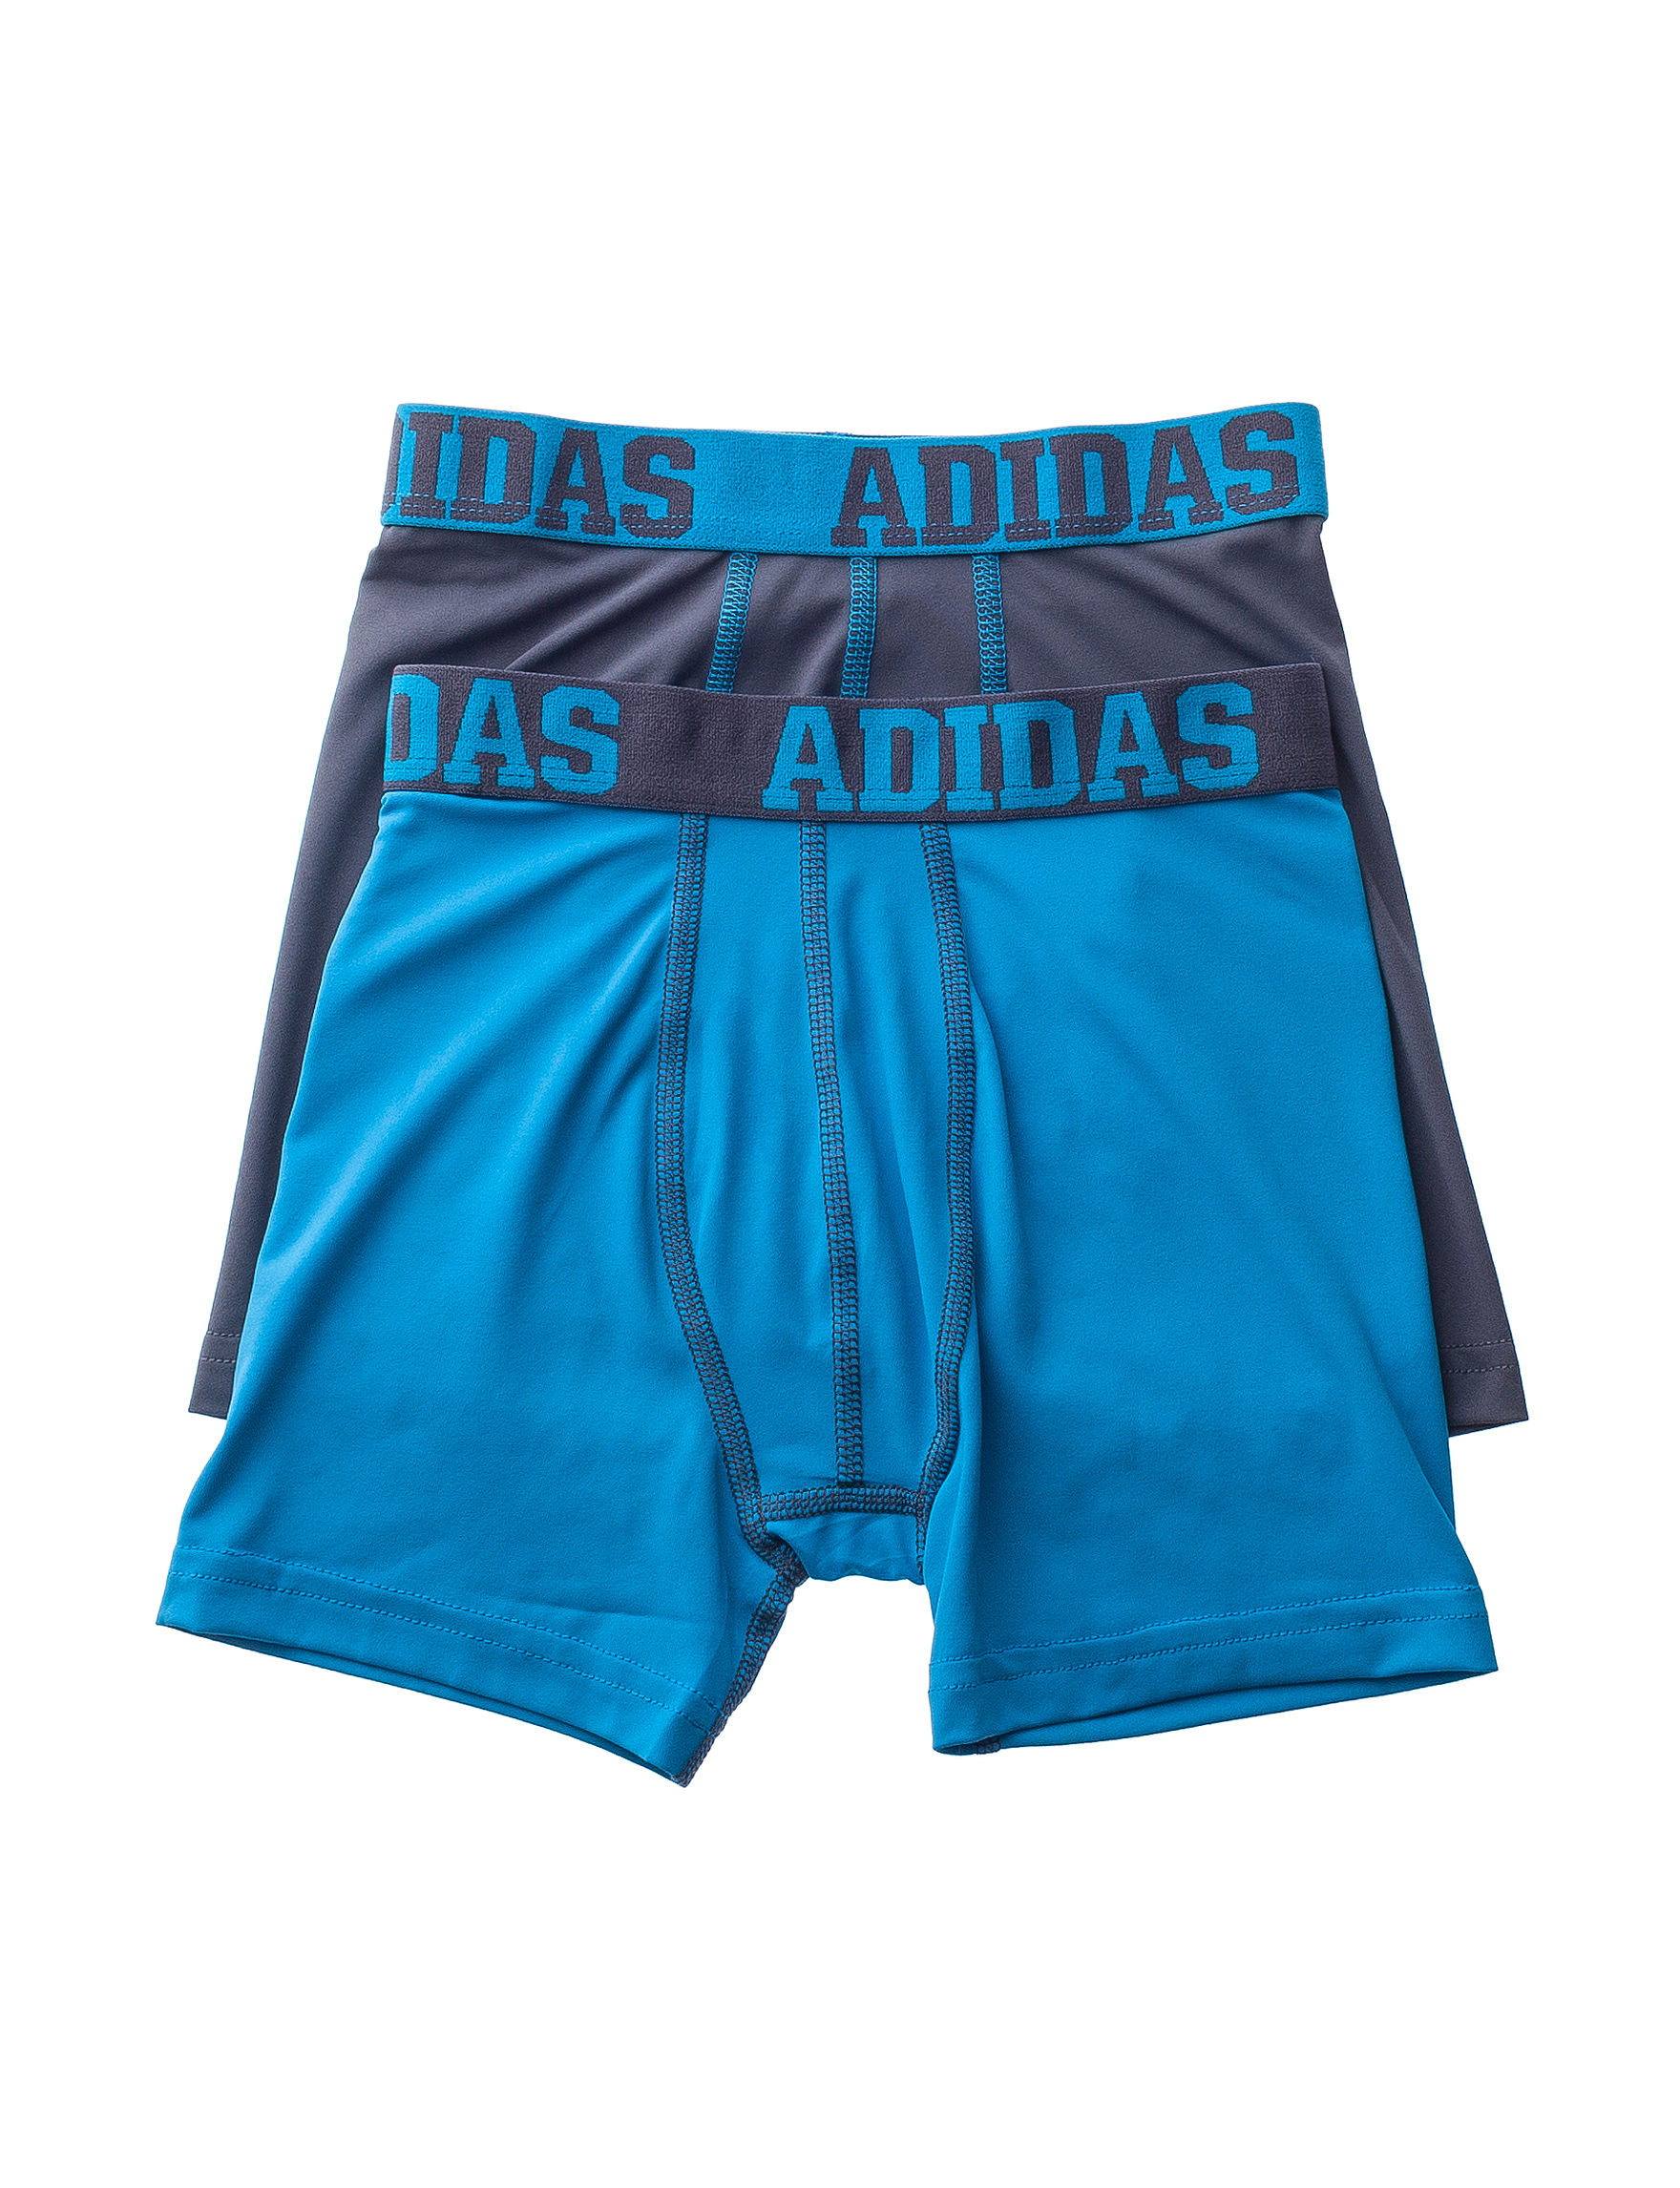 Adidas Grey / Blue Boxer Briefs